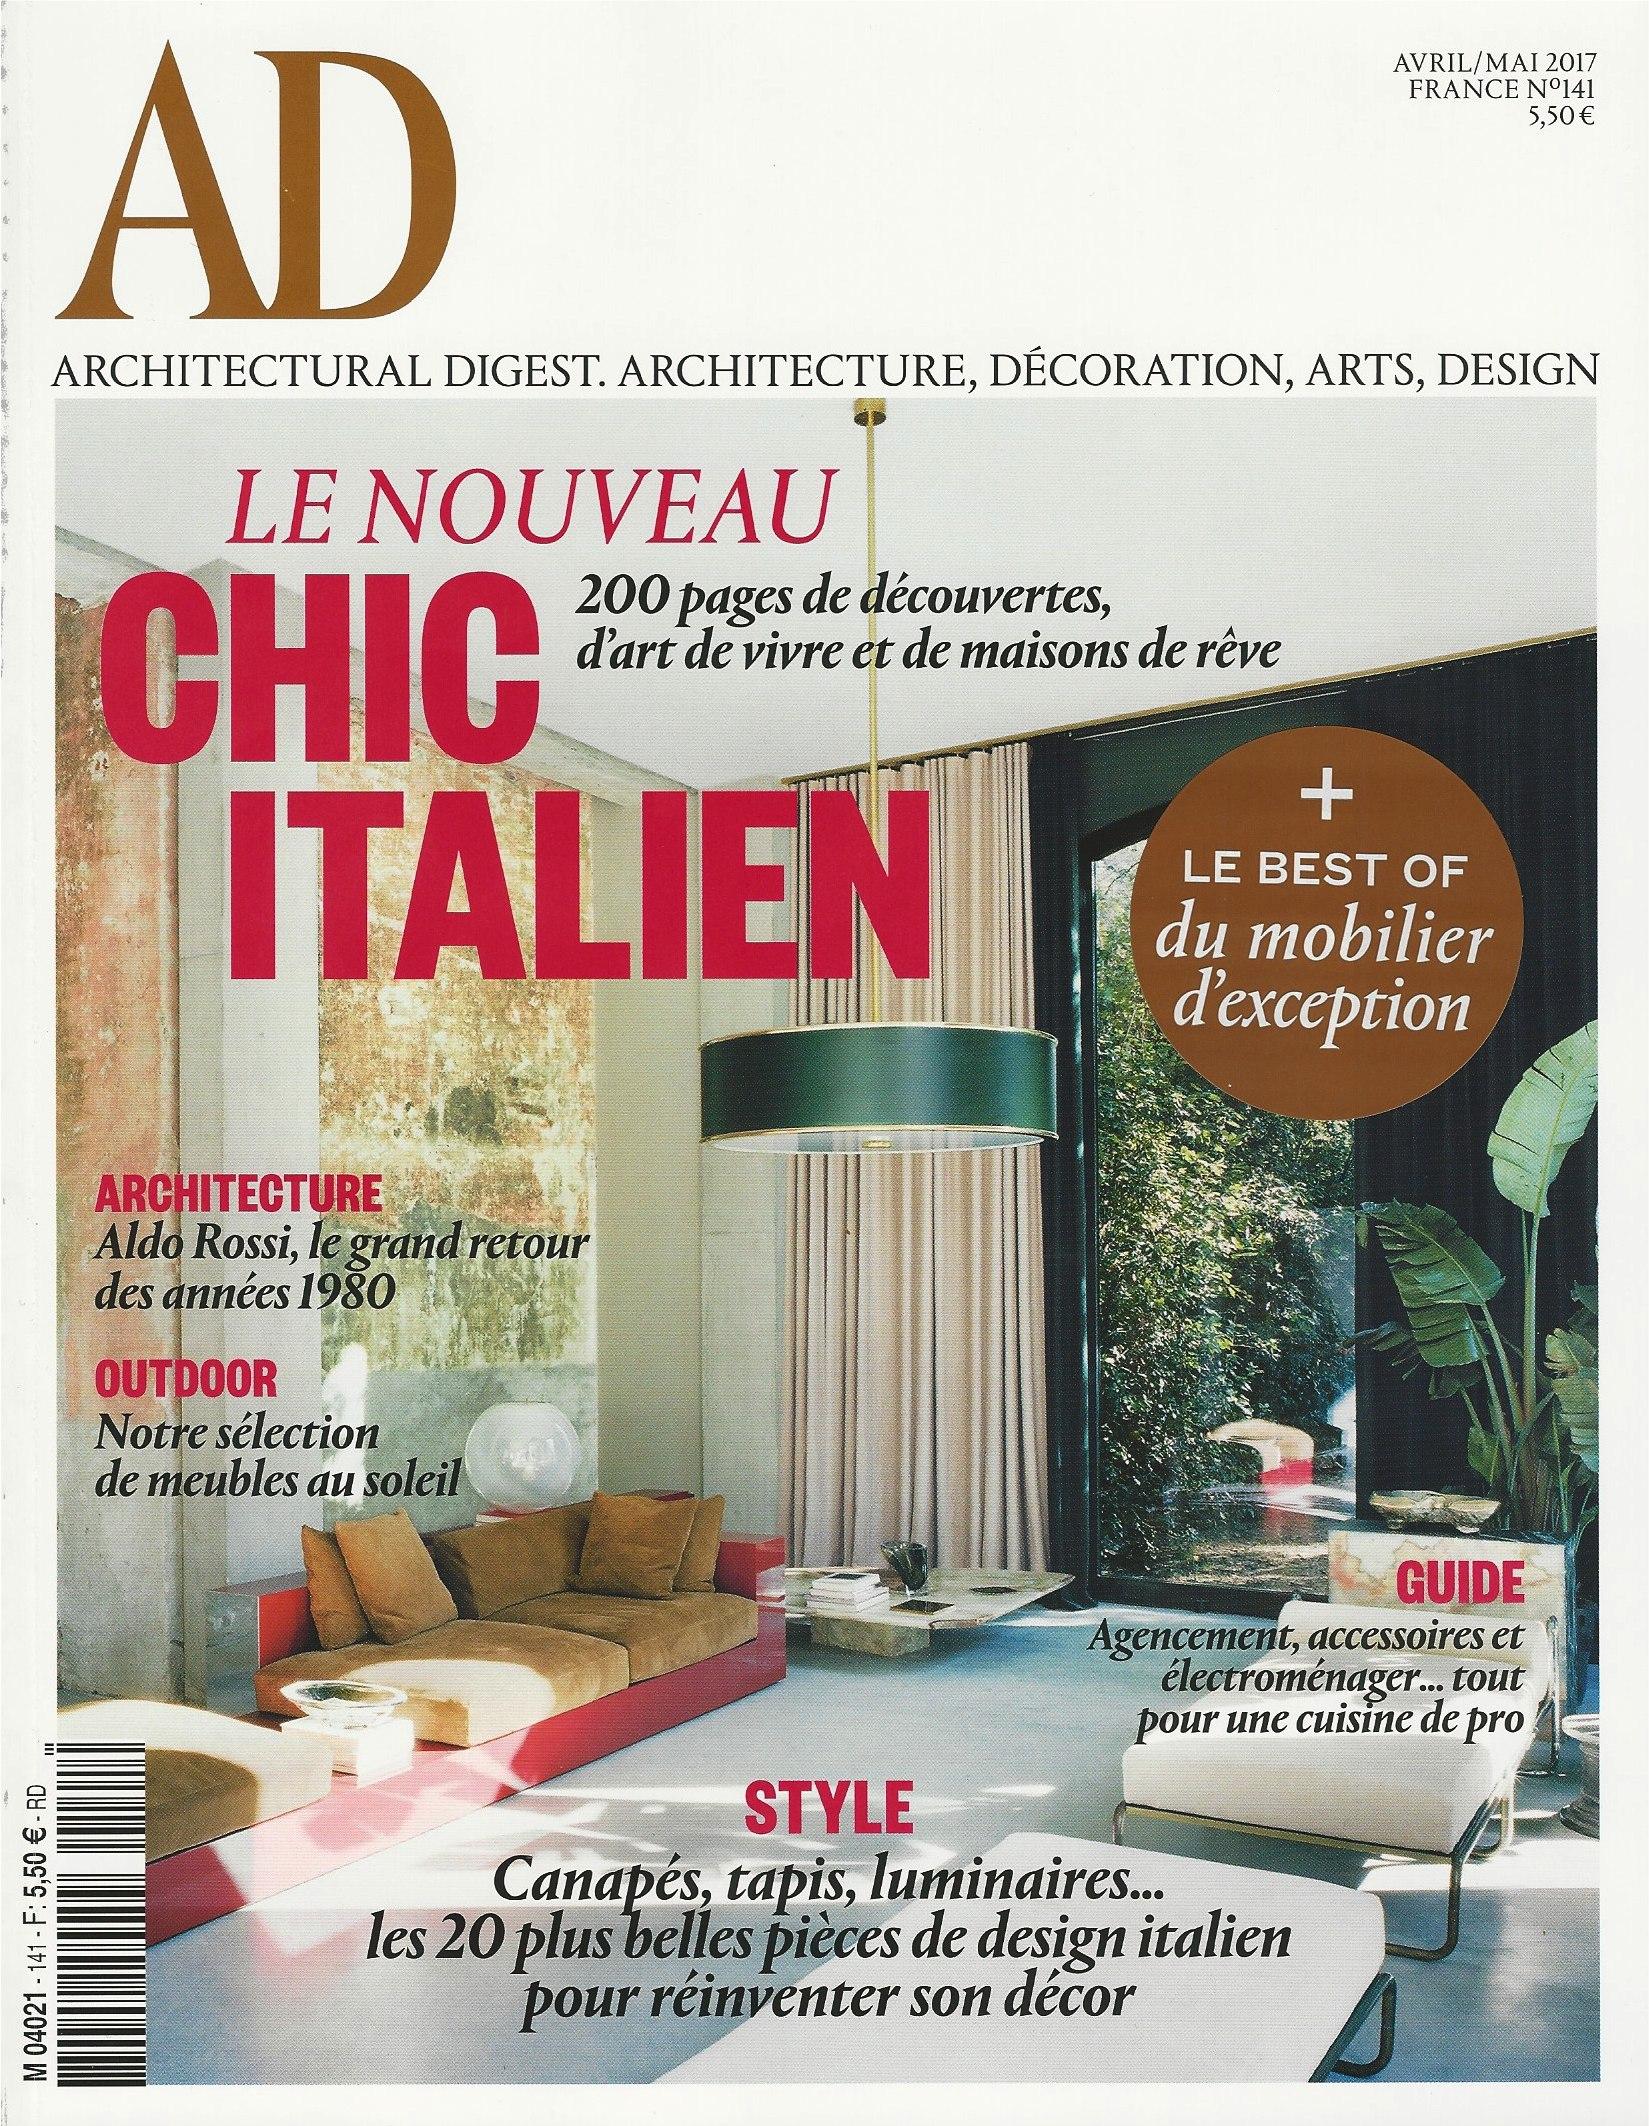 AD France Avril_mai 17 IGDM